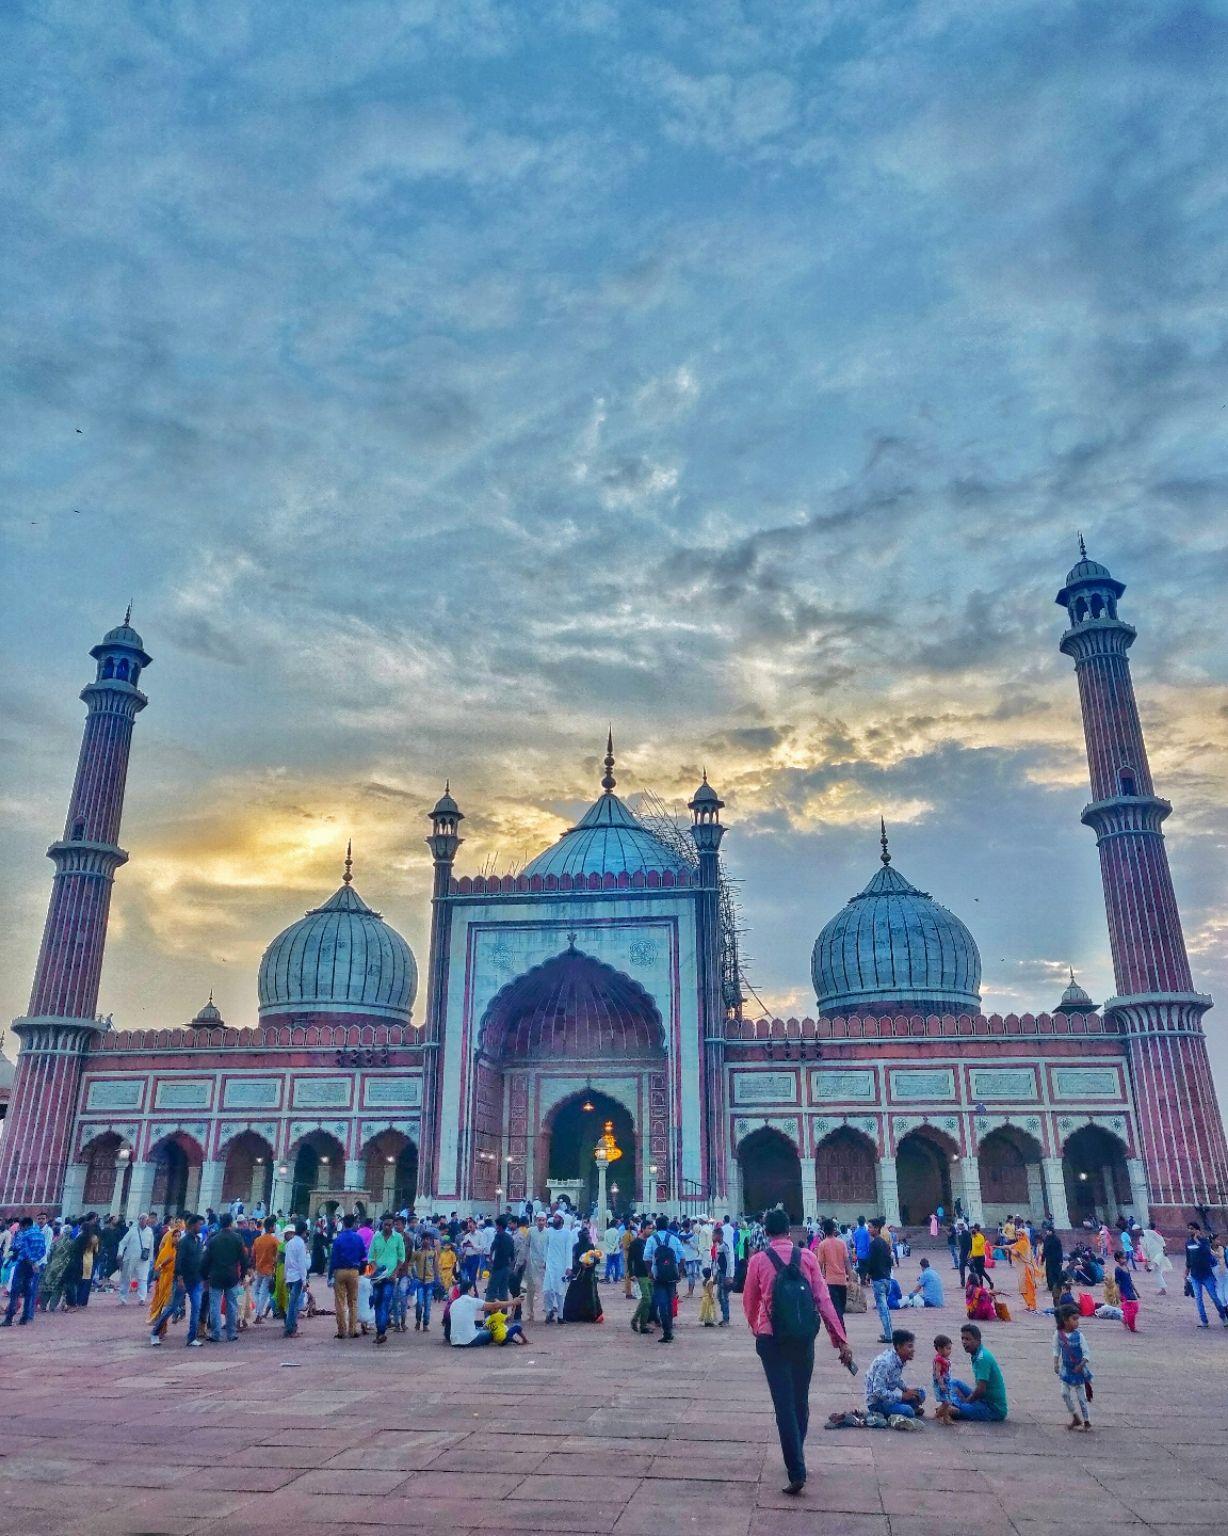 Photo of Jama Masjid By Gaurav Verma aka LifeofGaurav